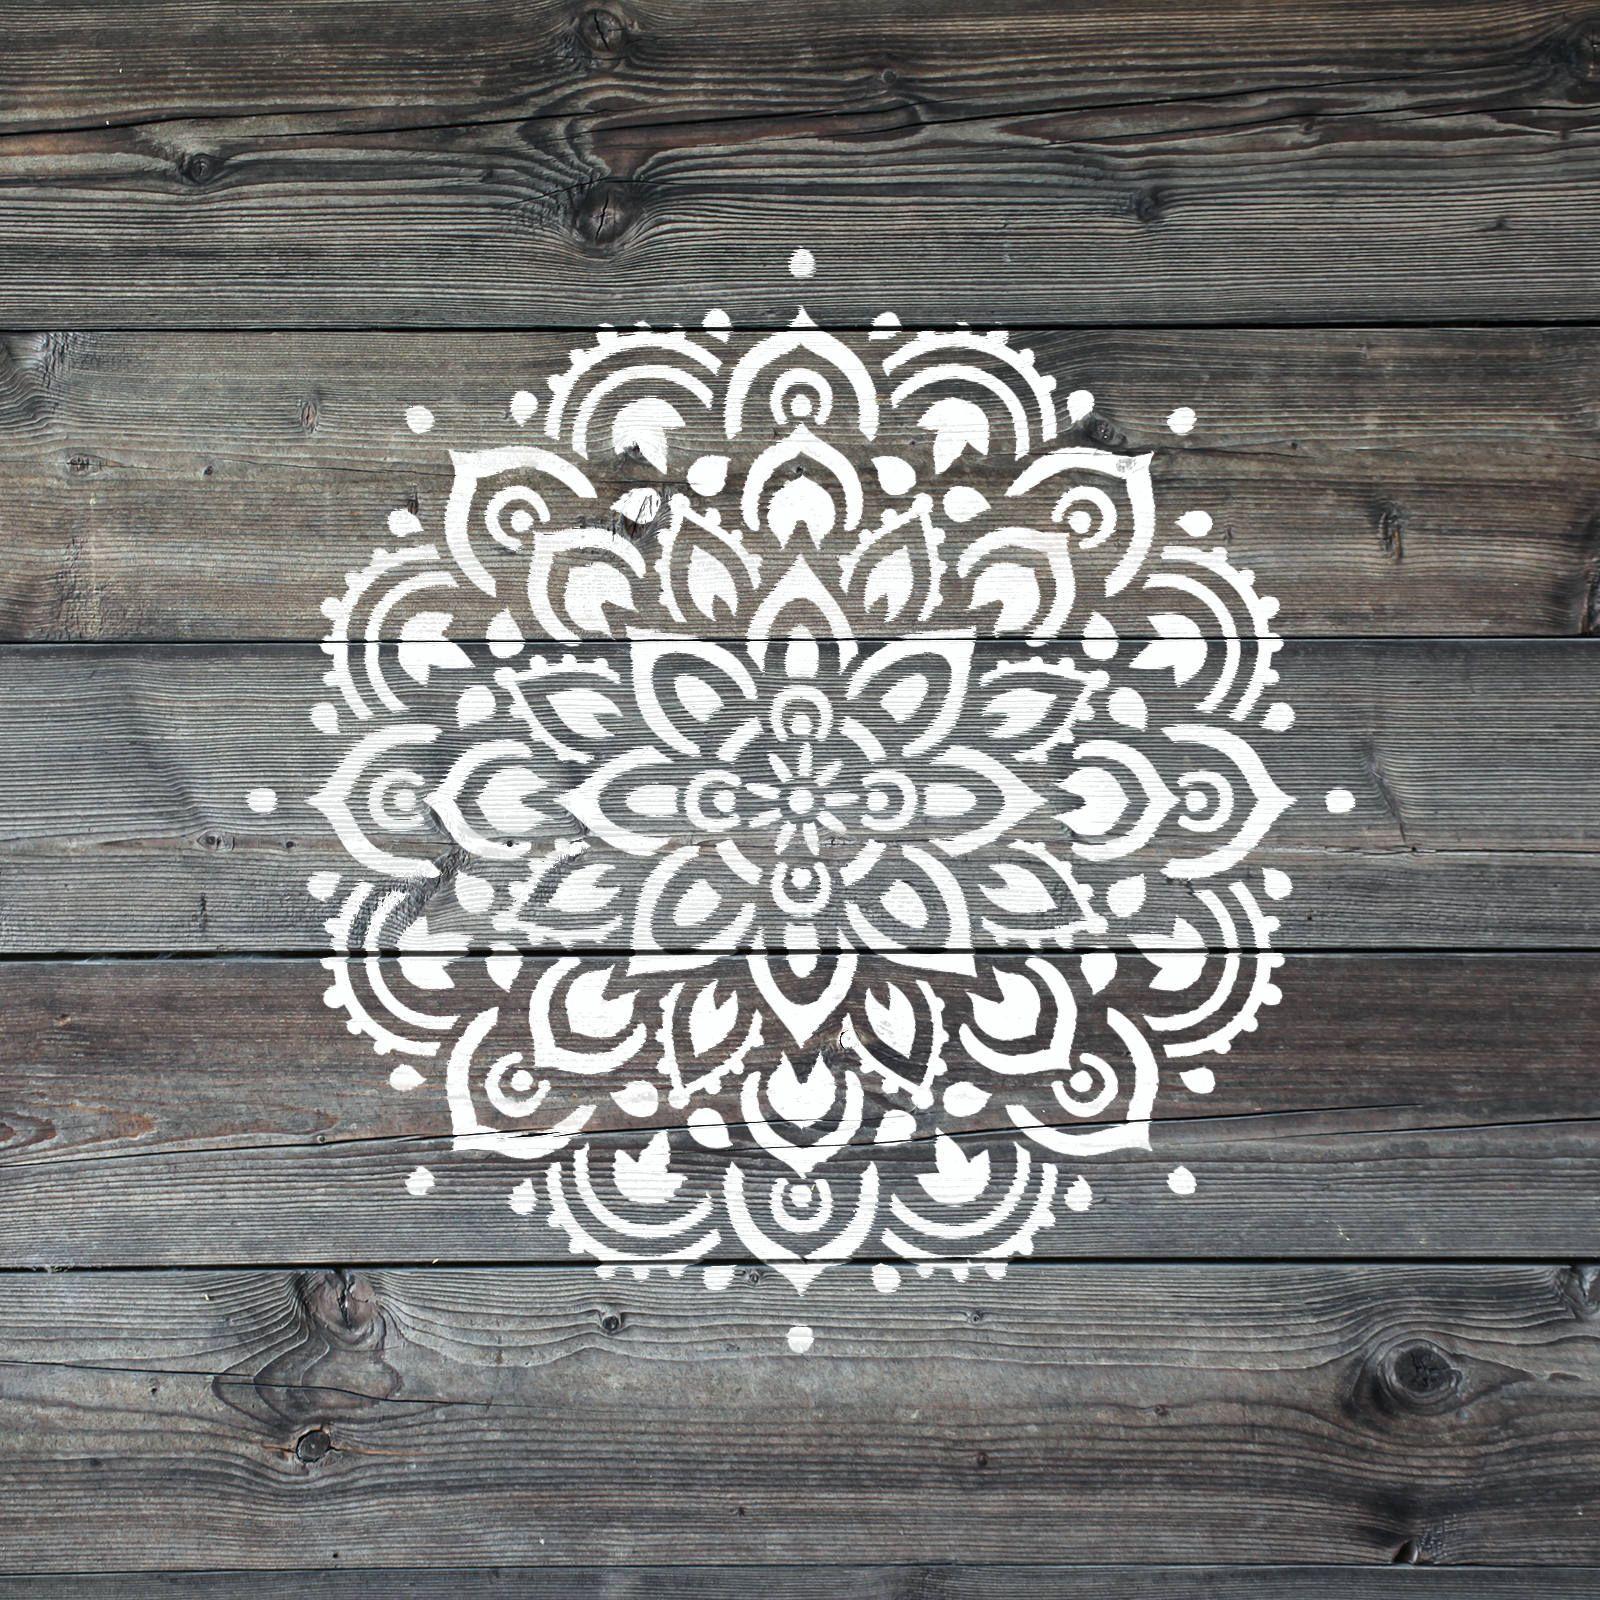 Mandala Stencil for Walls and DIY Crafts - Reusable Wall Stencils of ...